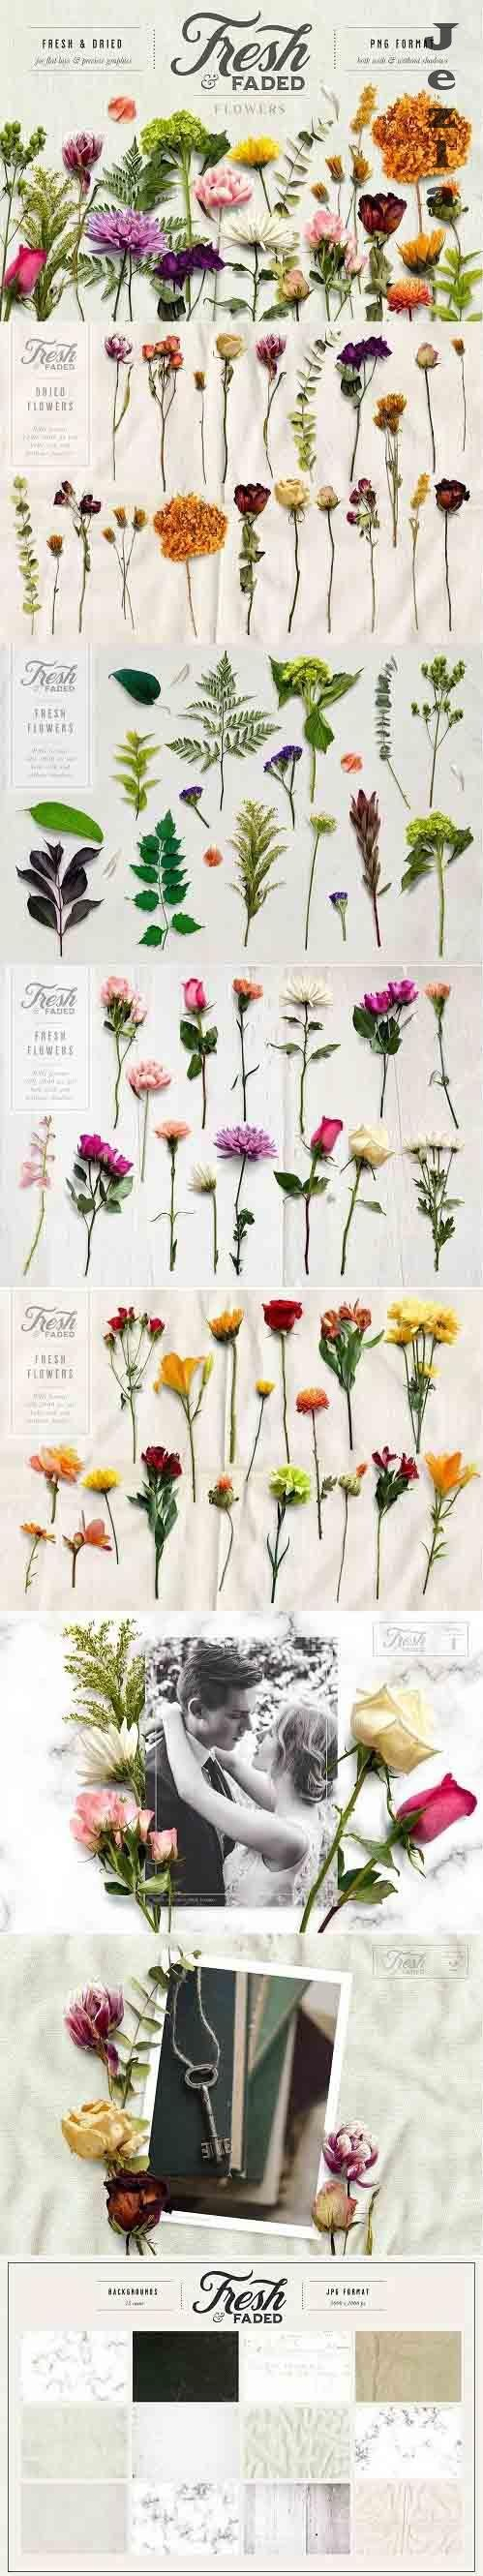 CreativeMarket - Fresh & Dried Flower Flat Lay 5350737